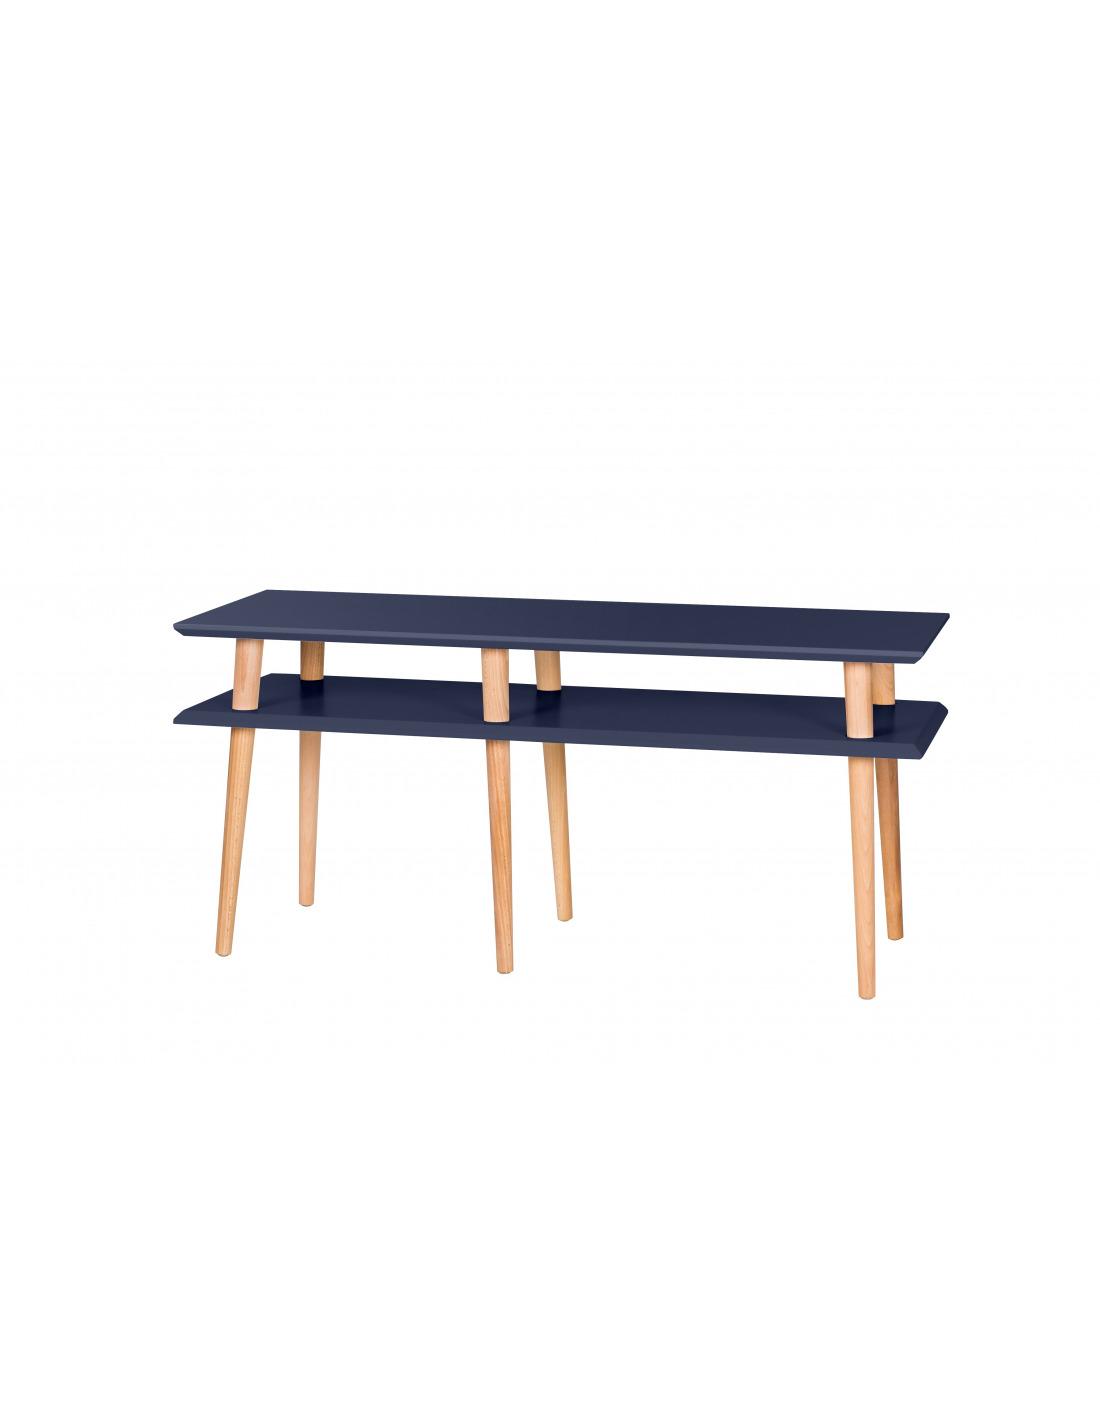 banc en bois mugo 119 par marcin g adzik au design. Black Bedroom Furniture Sets. Home Design Ideas